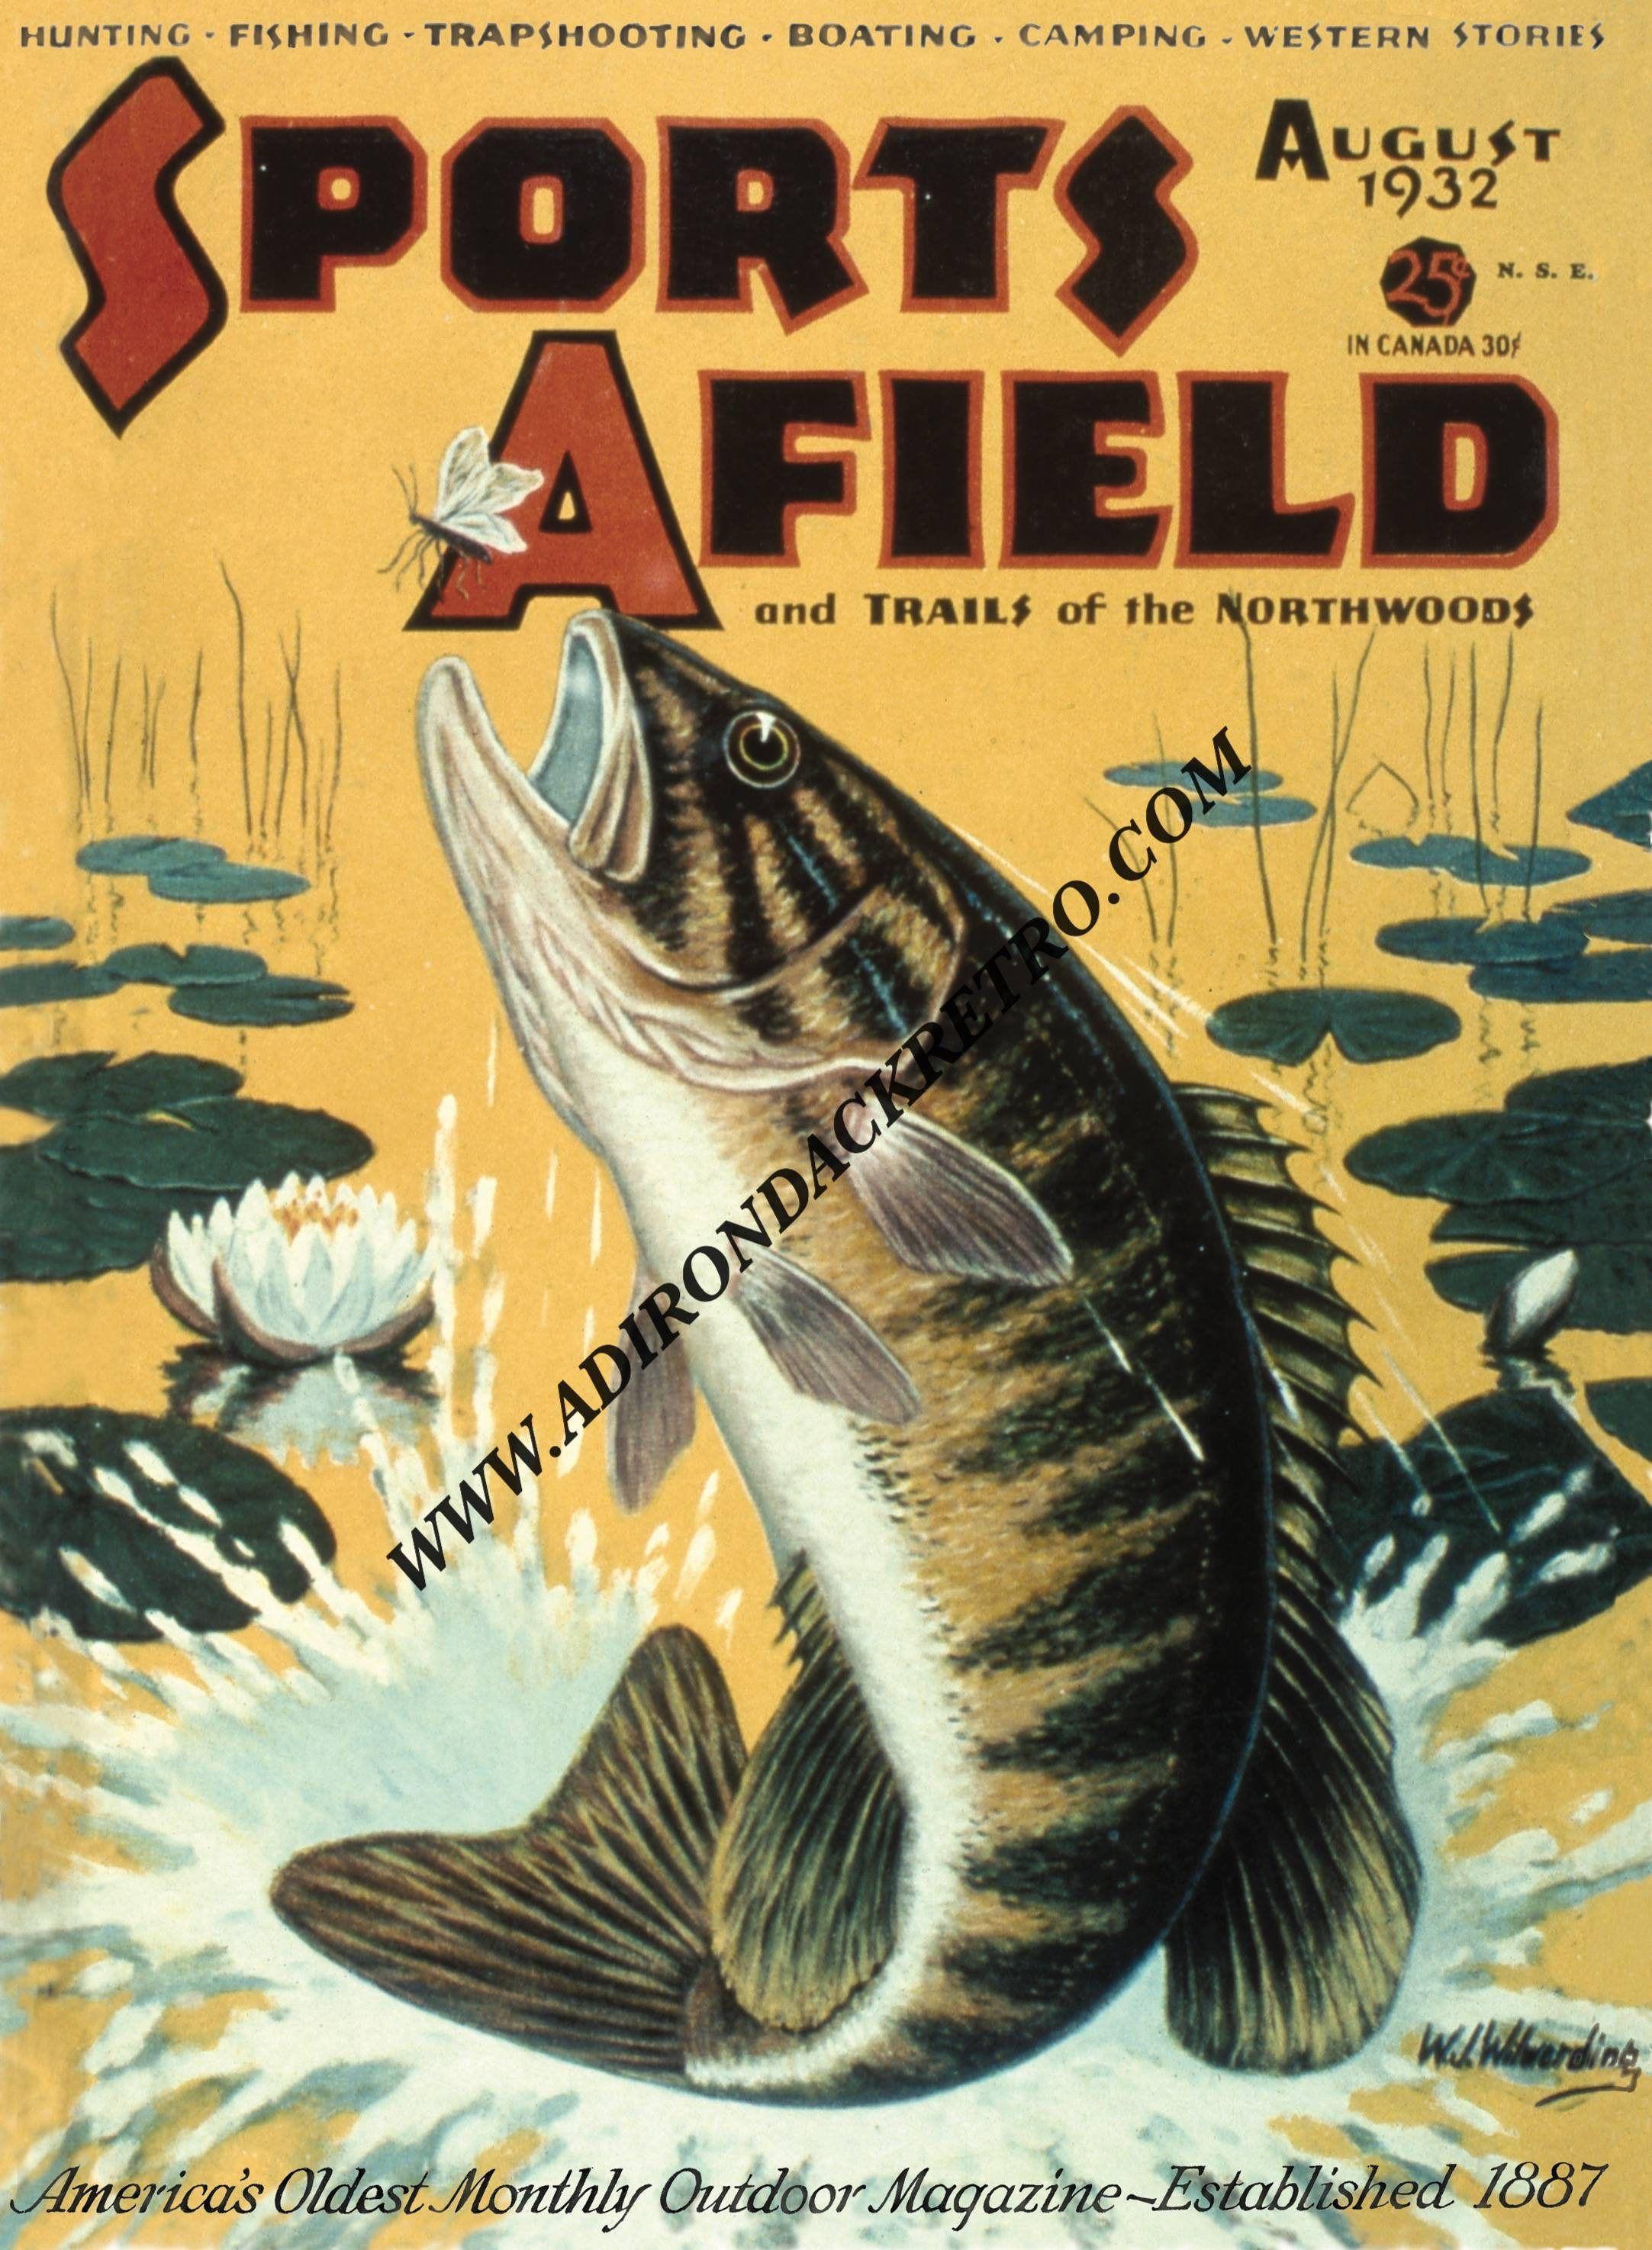 Bass Fishing Print - Vintage Fishing Lure Print - Fish Wall Art ...